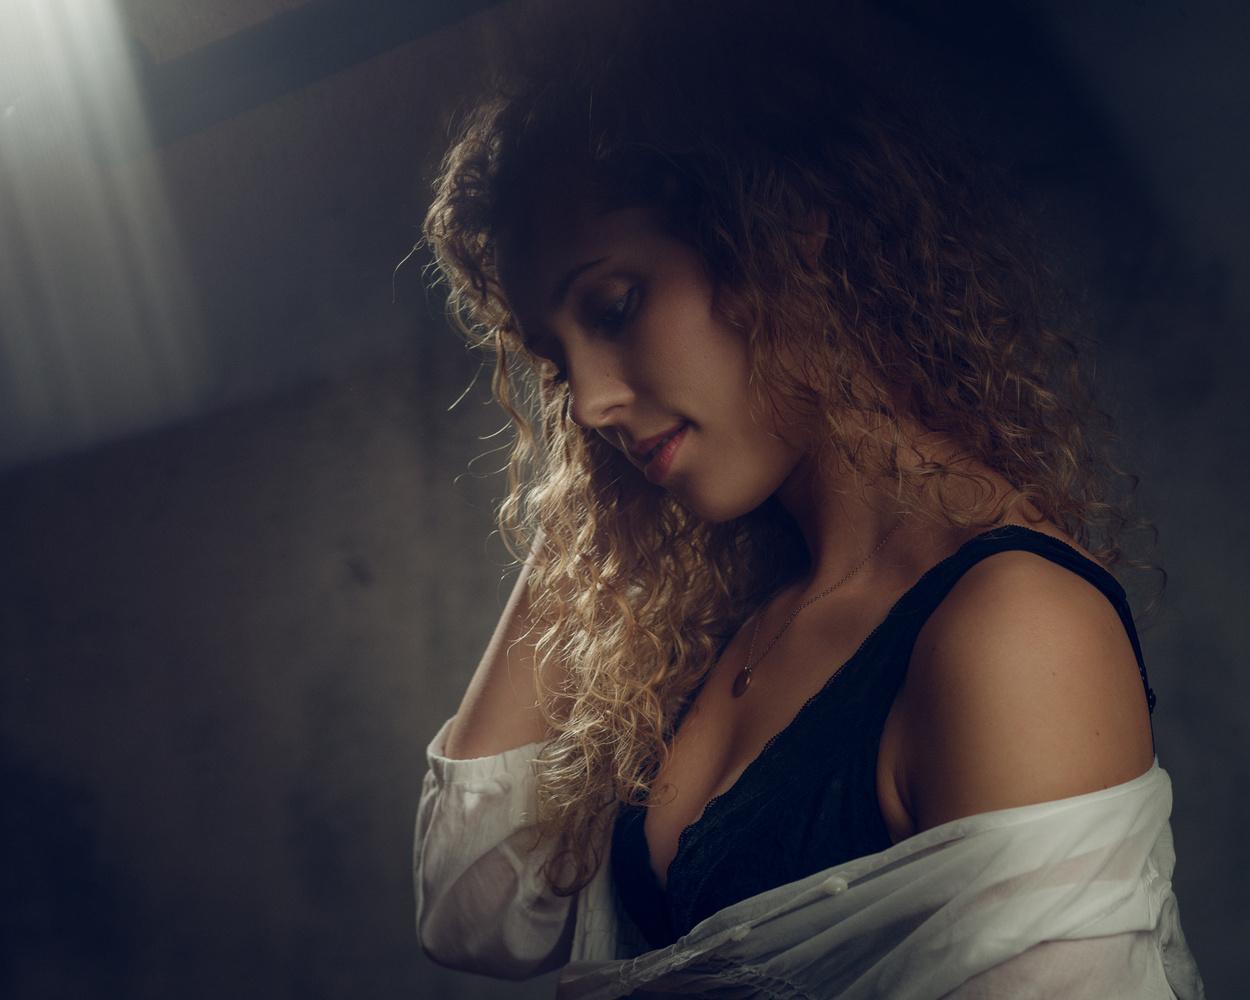 Alena by Michael Kloetzer